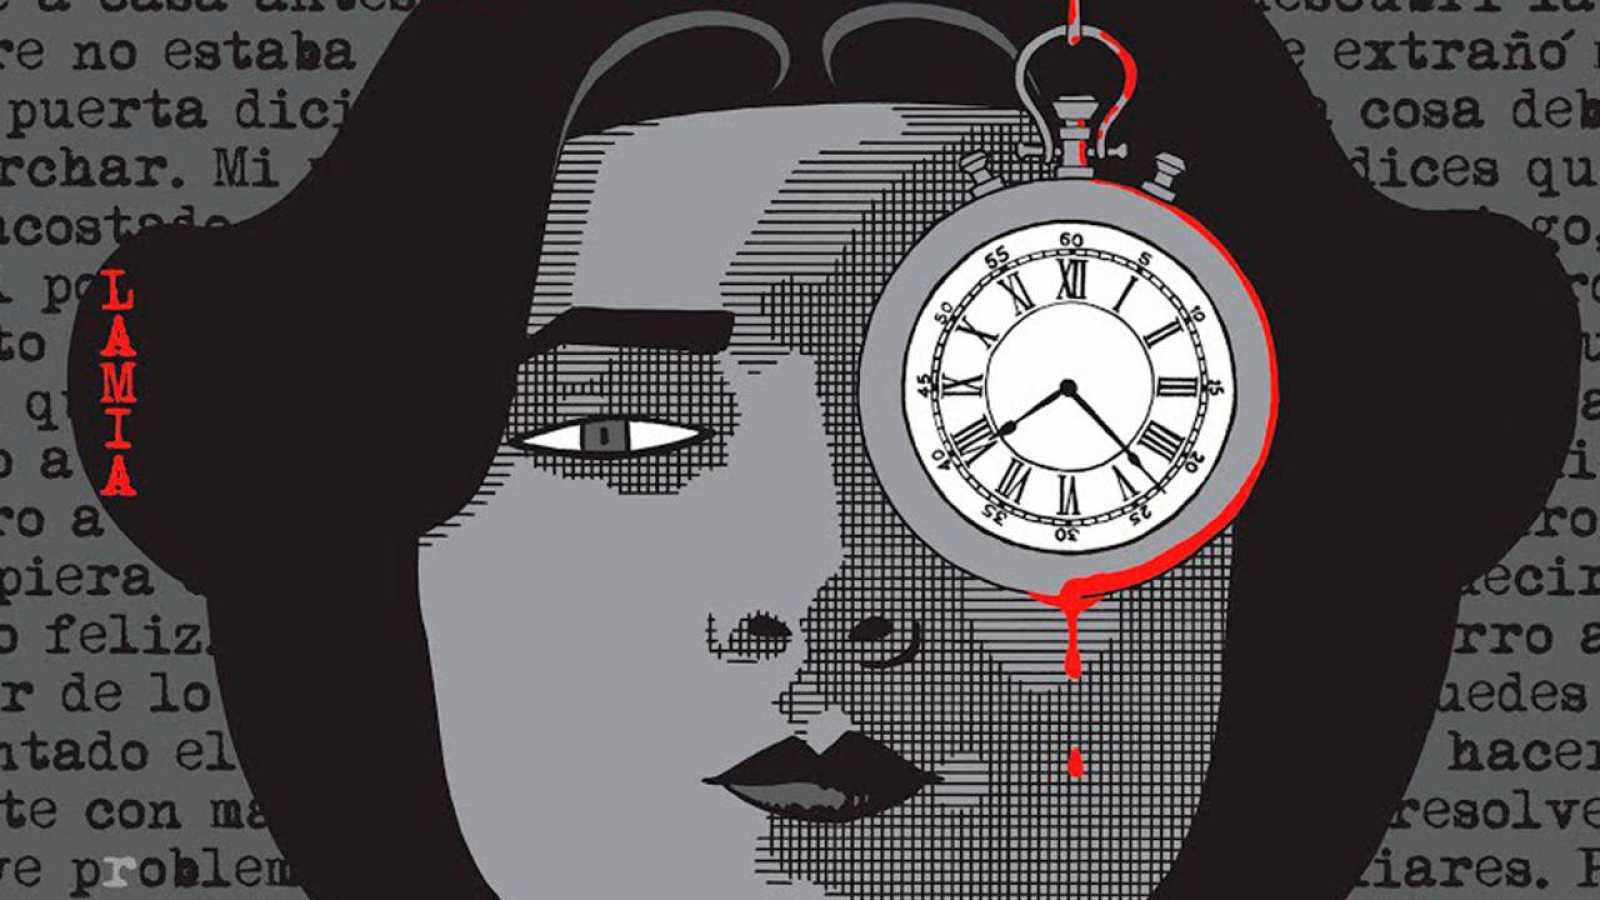 Fragmento de la portada de 'Lamia'